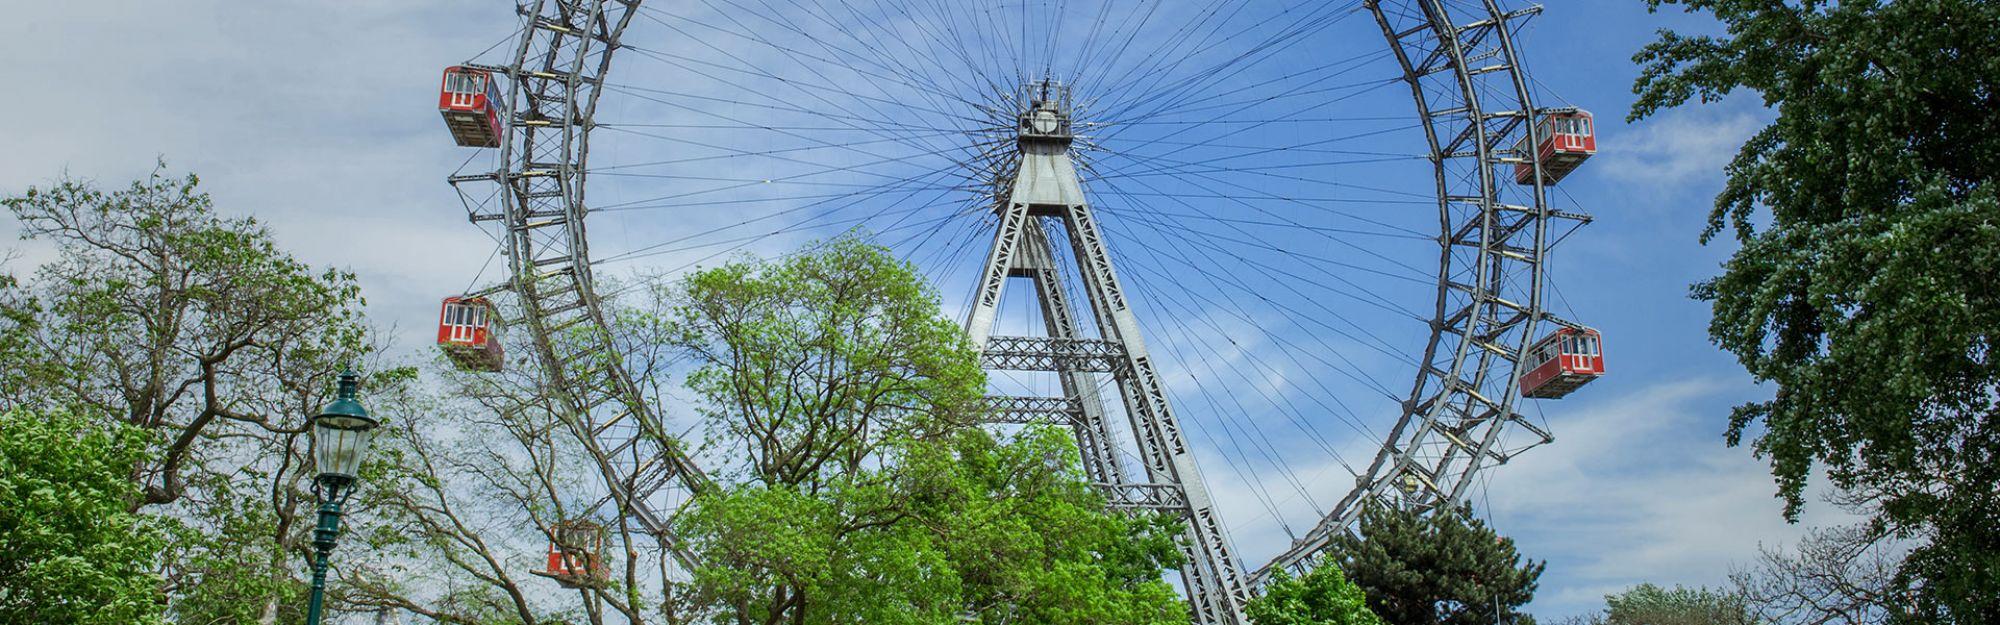 Viena Wiener Riesenrad Giant Ferris Wheel